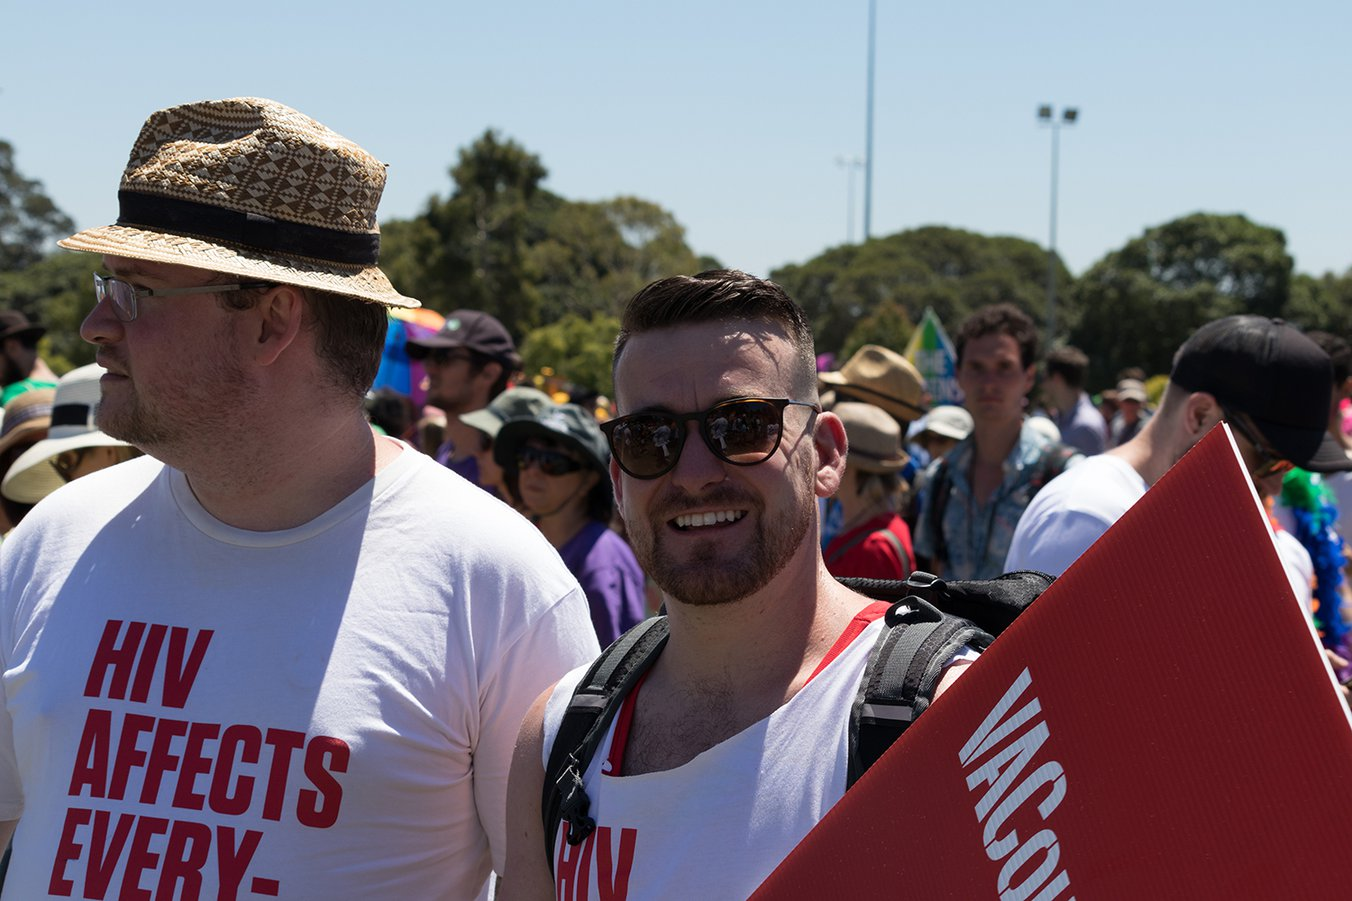 20170202_Pride March_Paul Rees_RE-SIZED_005.jpg